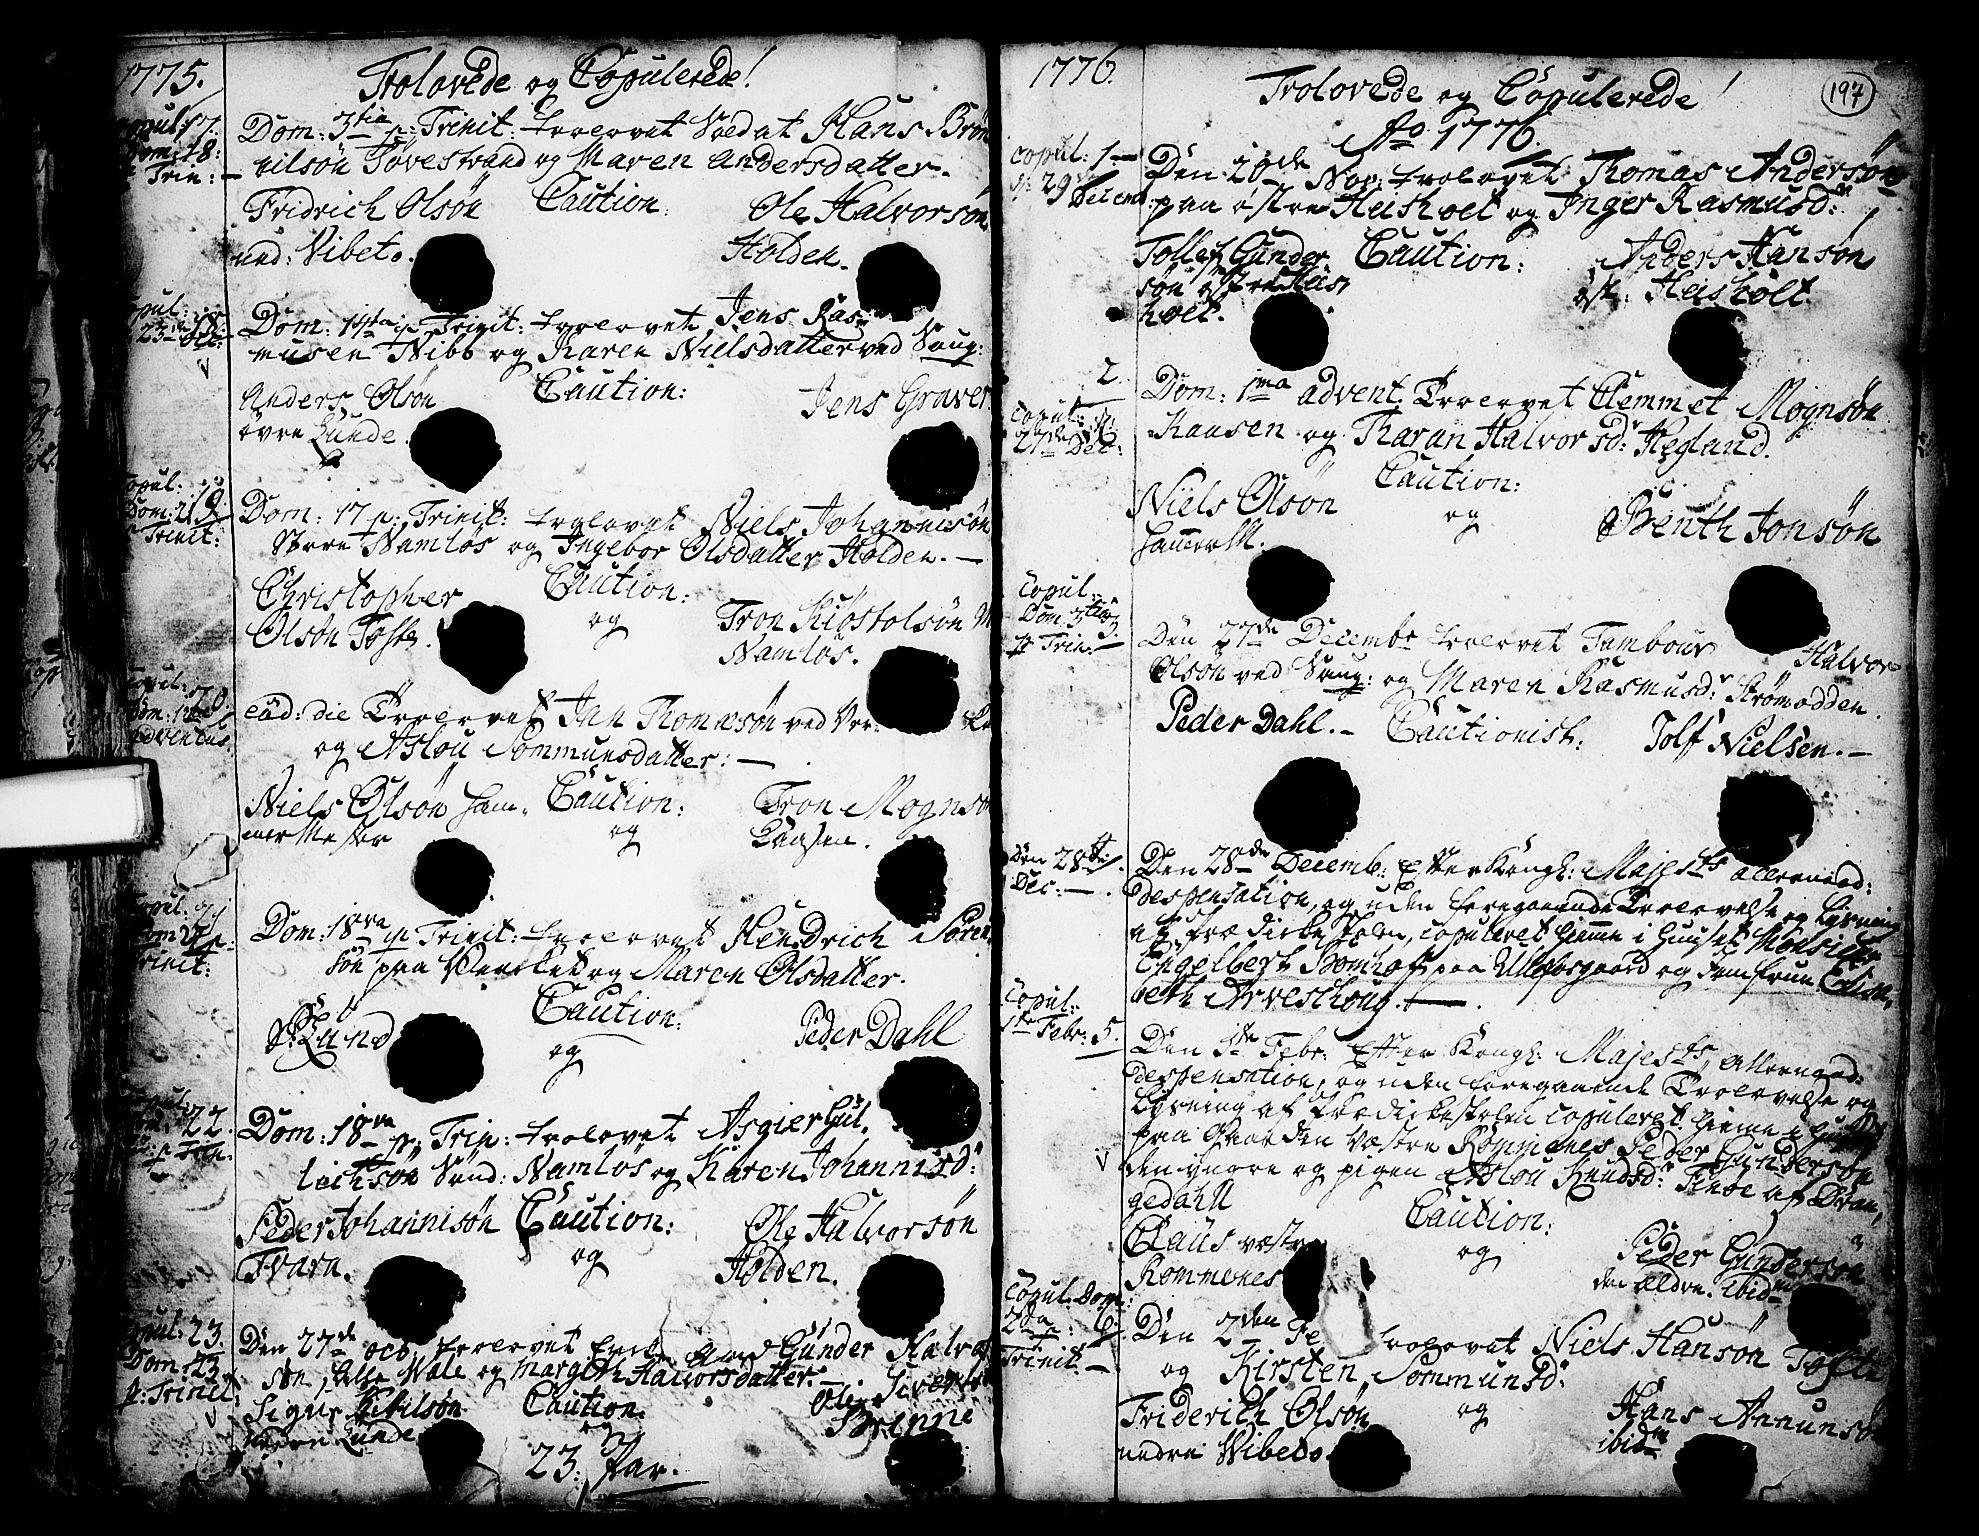 SAKO, Holla kirkebøker, F/Fa/L0001: Ministerialbok nr. 1, 1717-1779, s. 197